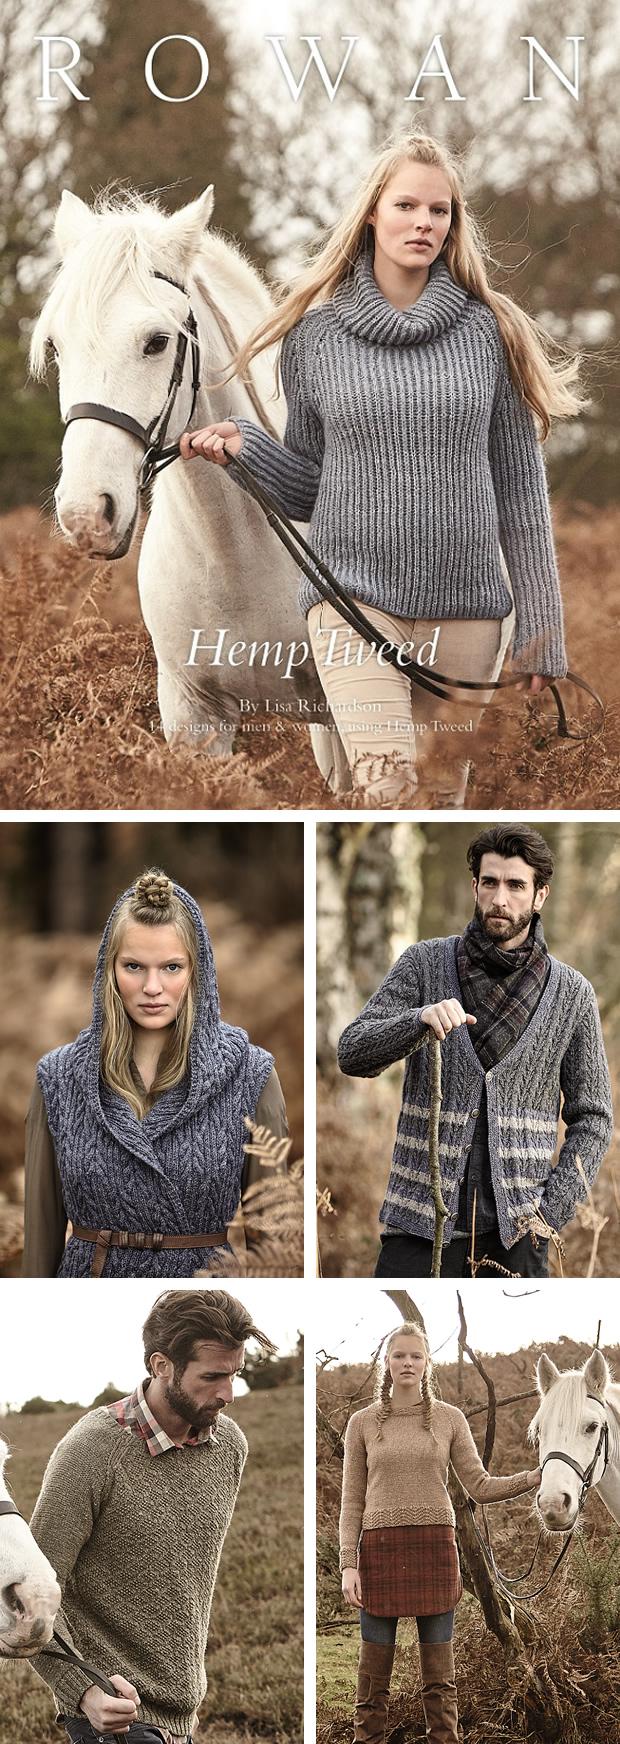 hemp_tweed_book